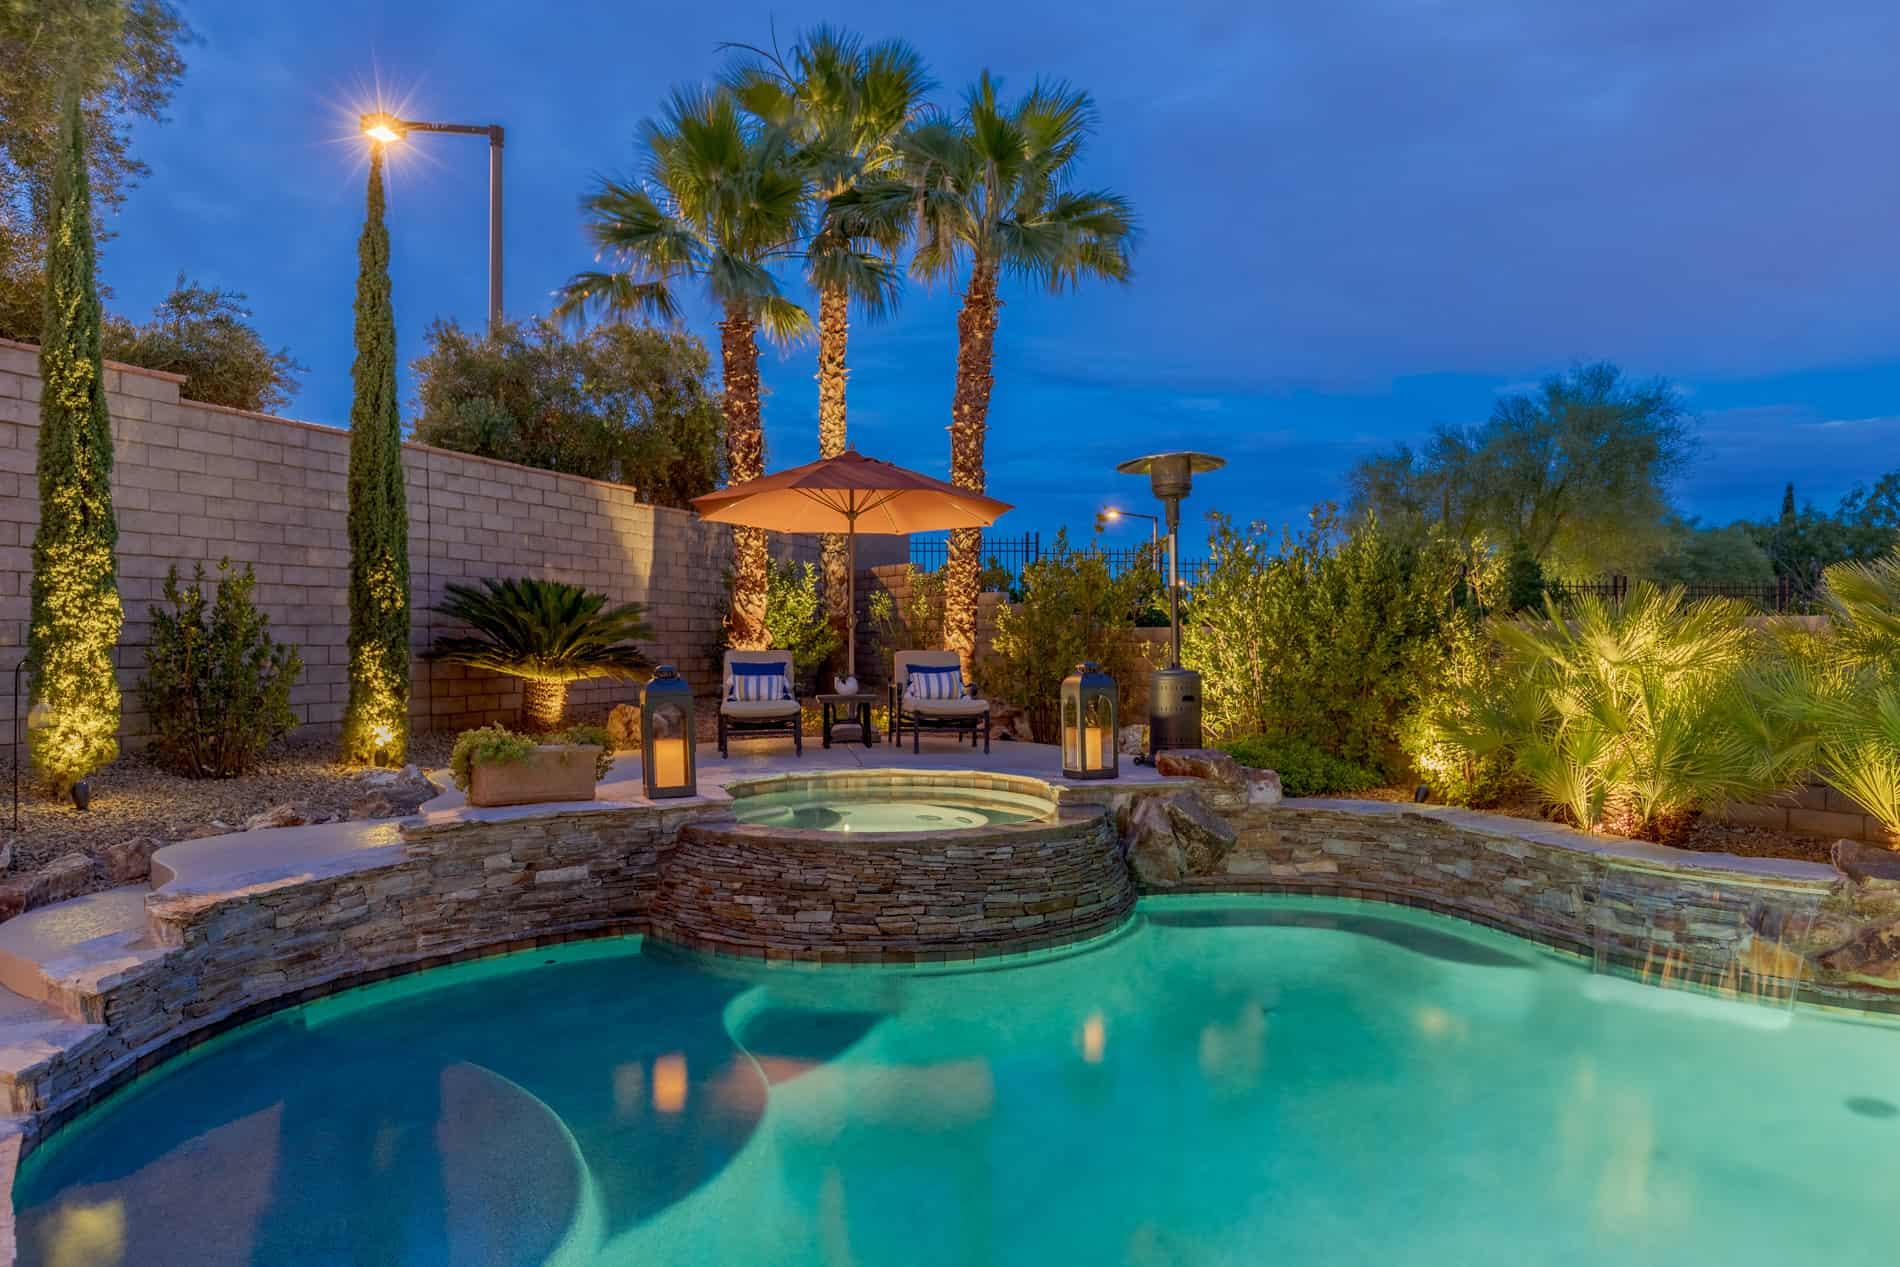 las-vegas-luxry-real-estate-realtor-rob-jensen-company-12108-vista-linda-avenue-the-paseos086